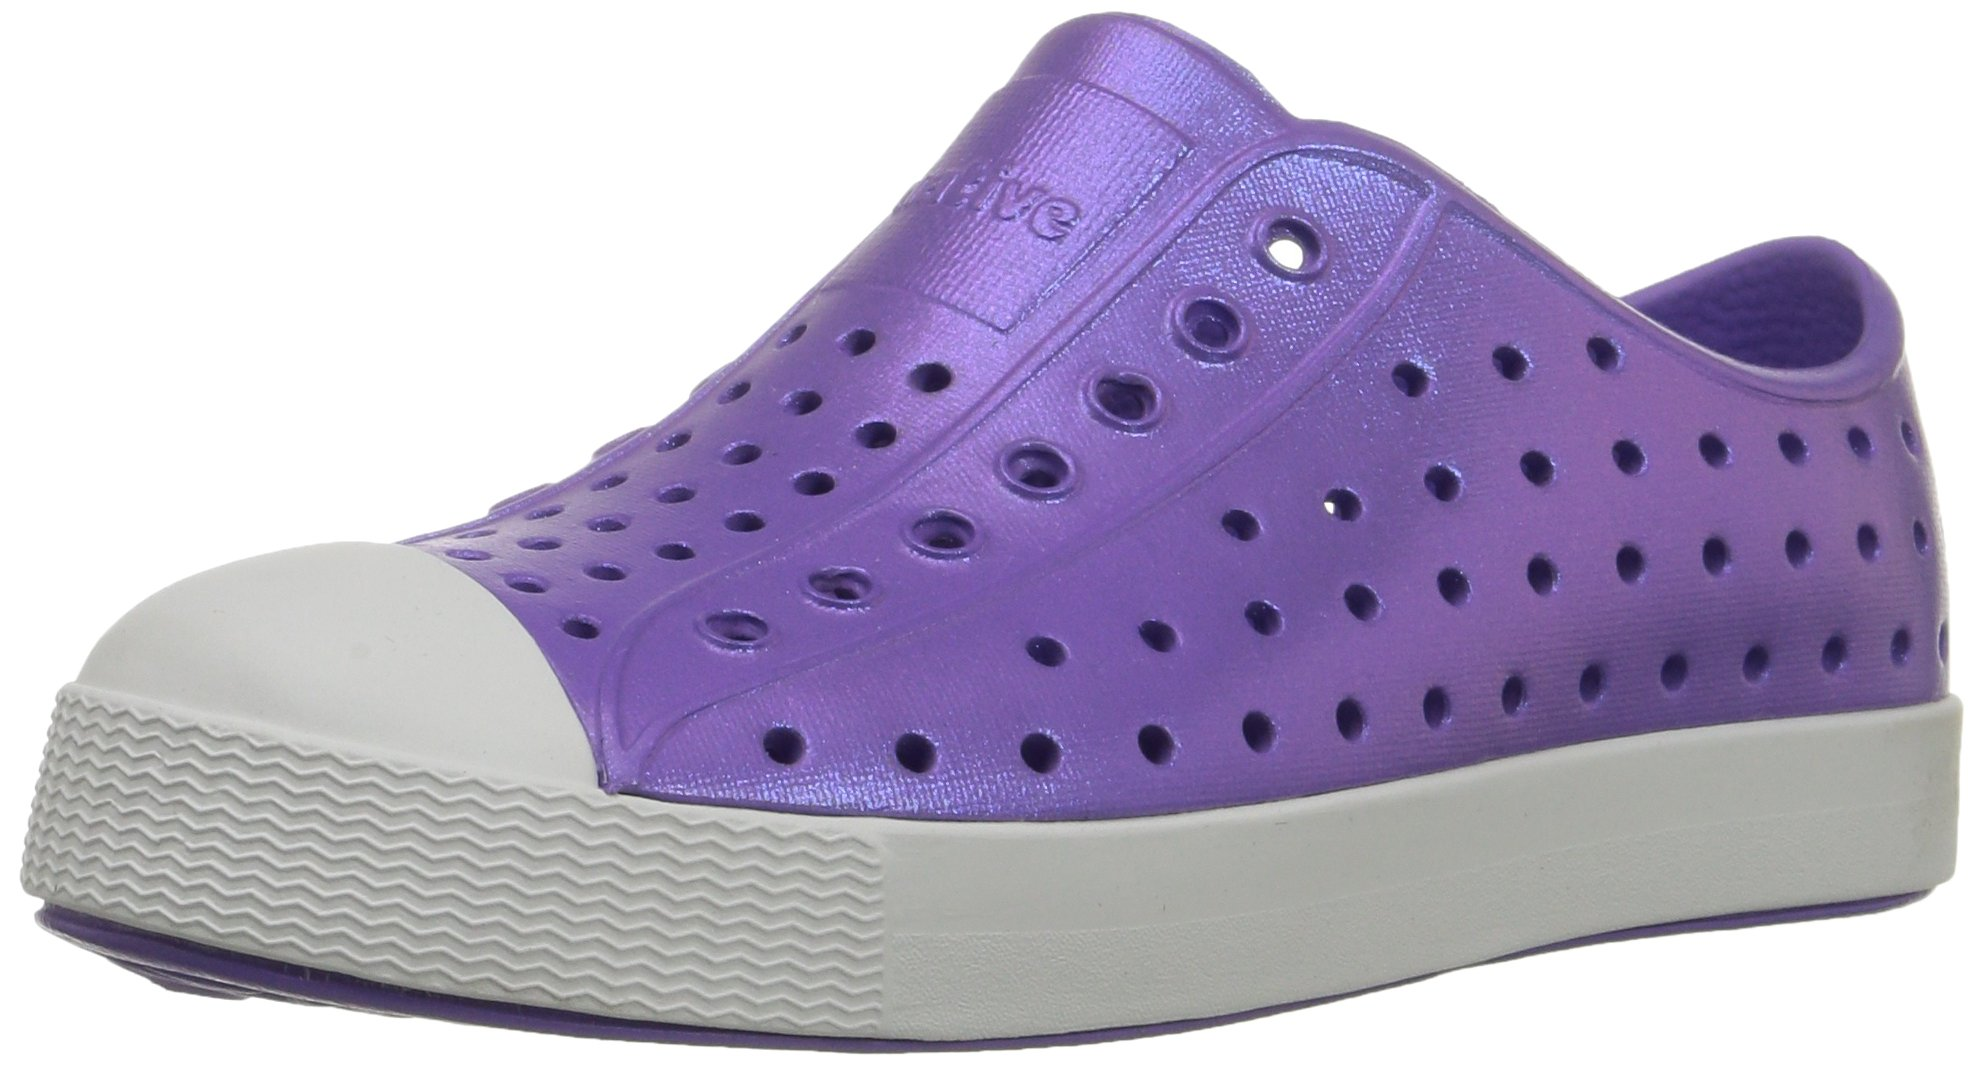 native Jefferson Slip-On Sneaker,Techno Purple Iridescence,7 M US Toddler